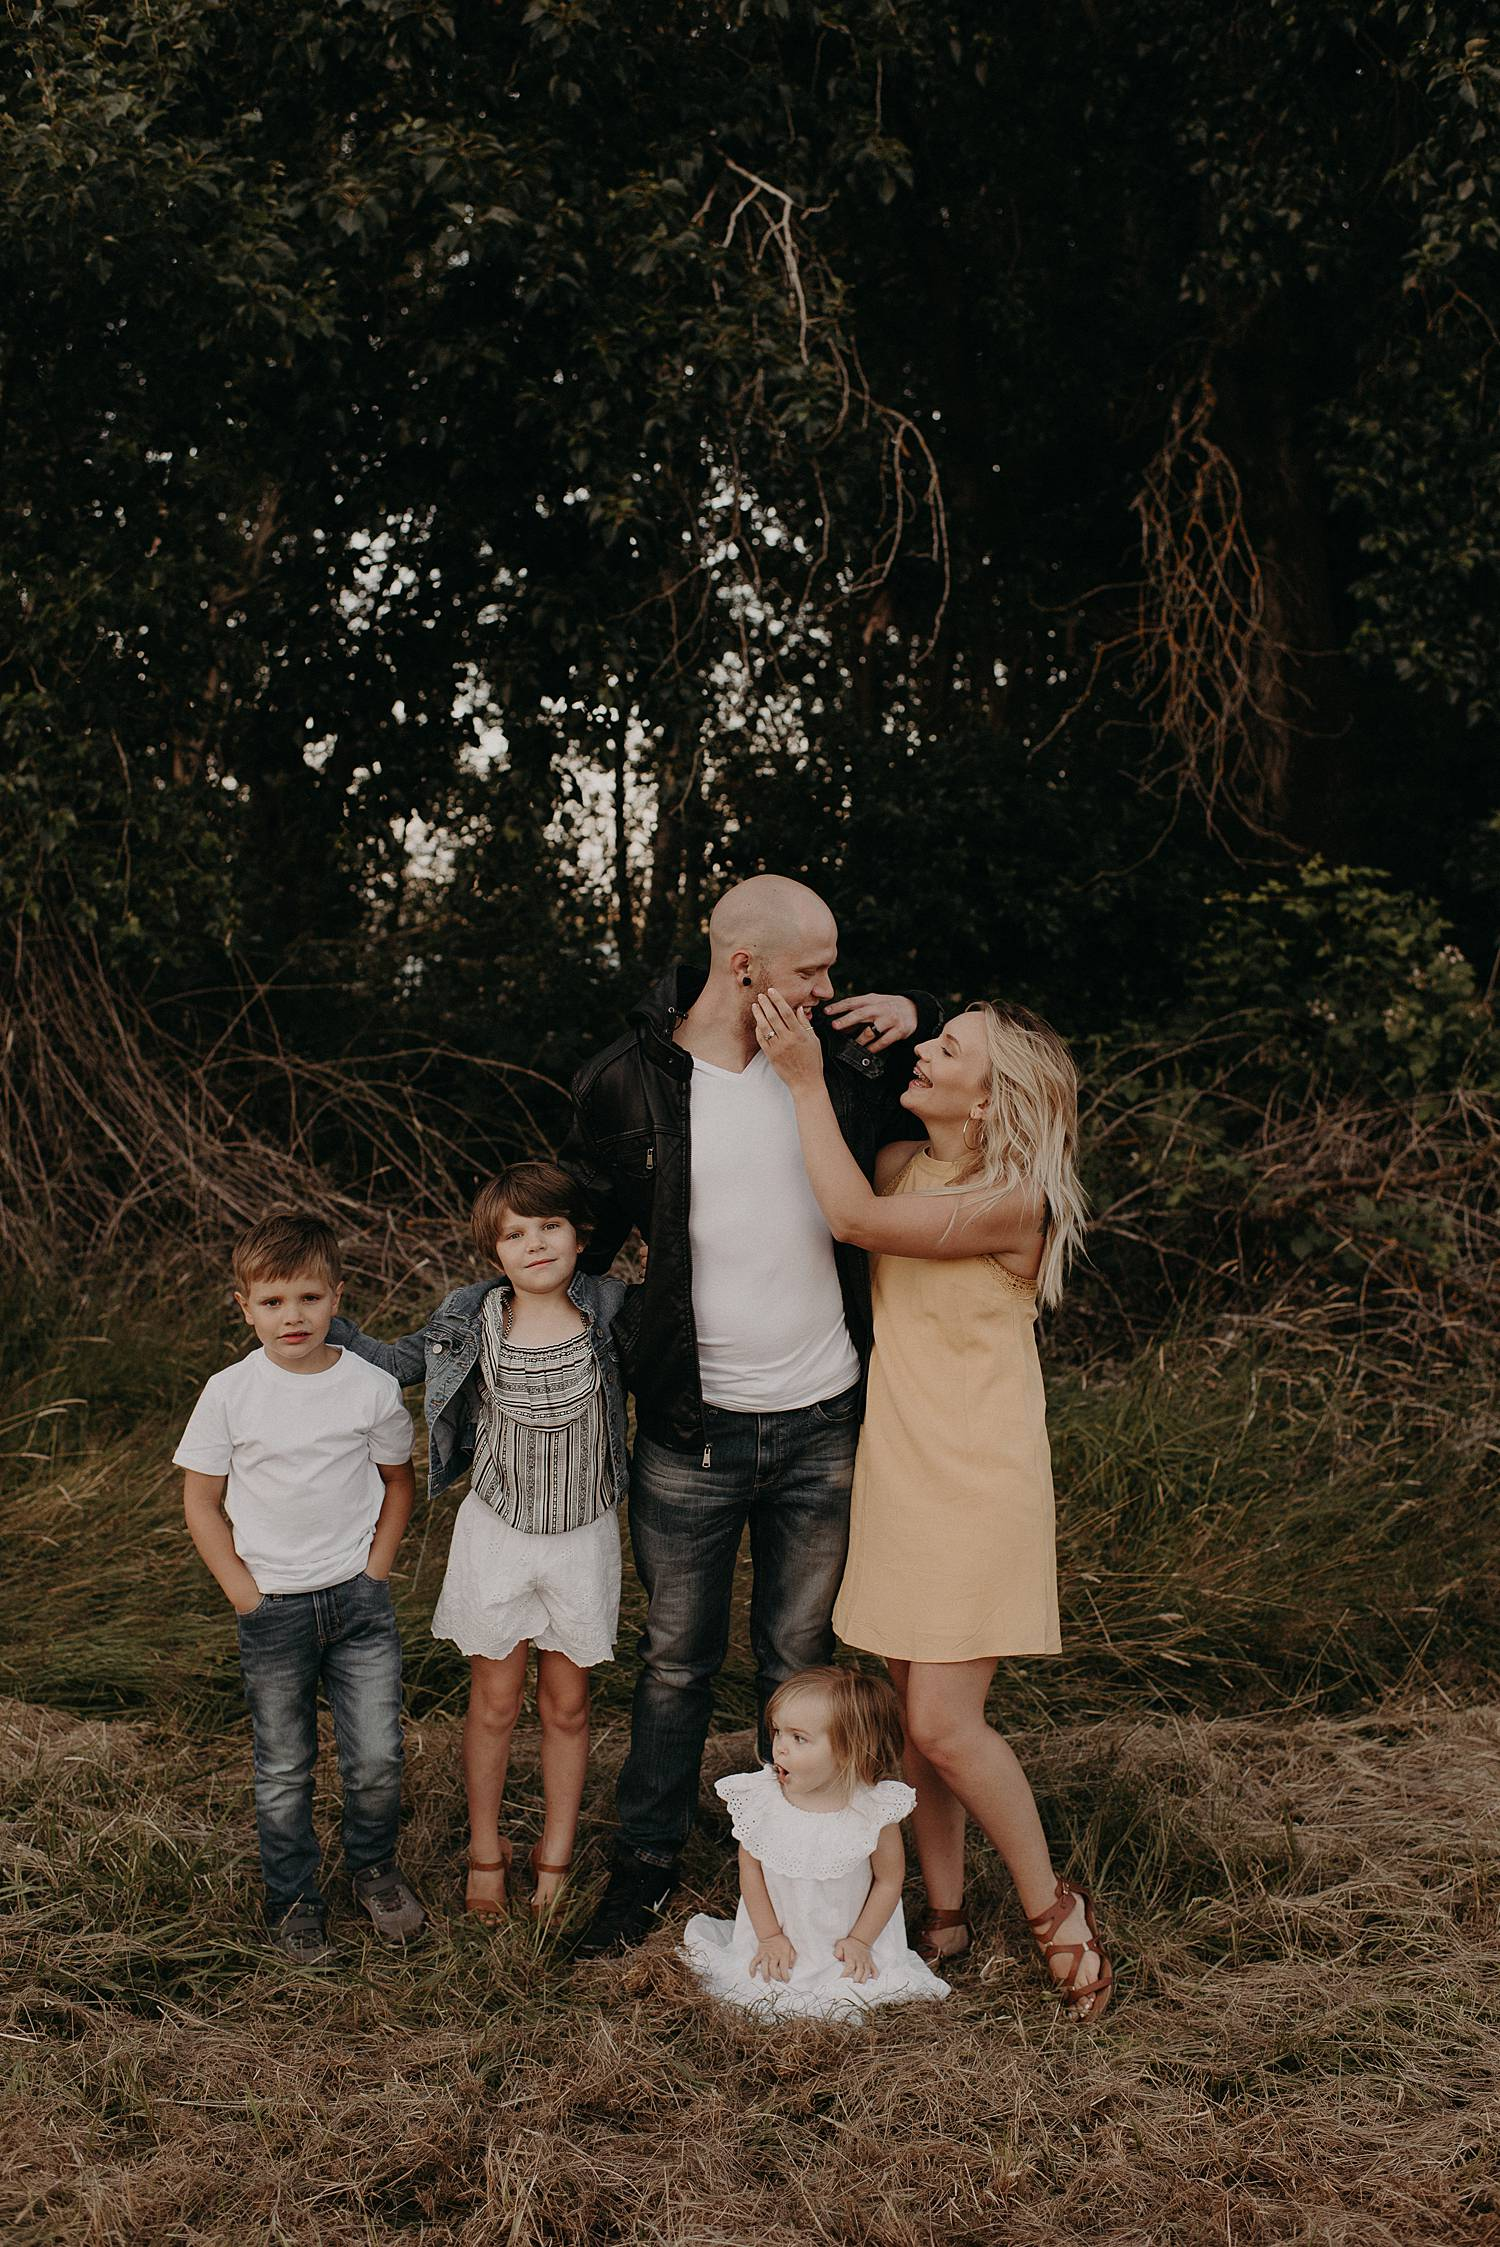 Washington_Oregon_Family_Wedding_Photographer_Jessie_Christensen_1376.jpg